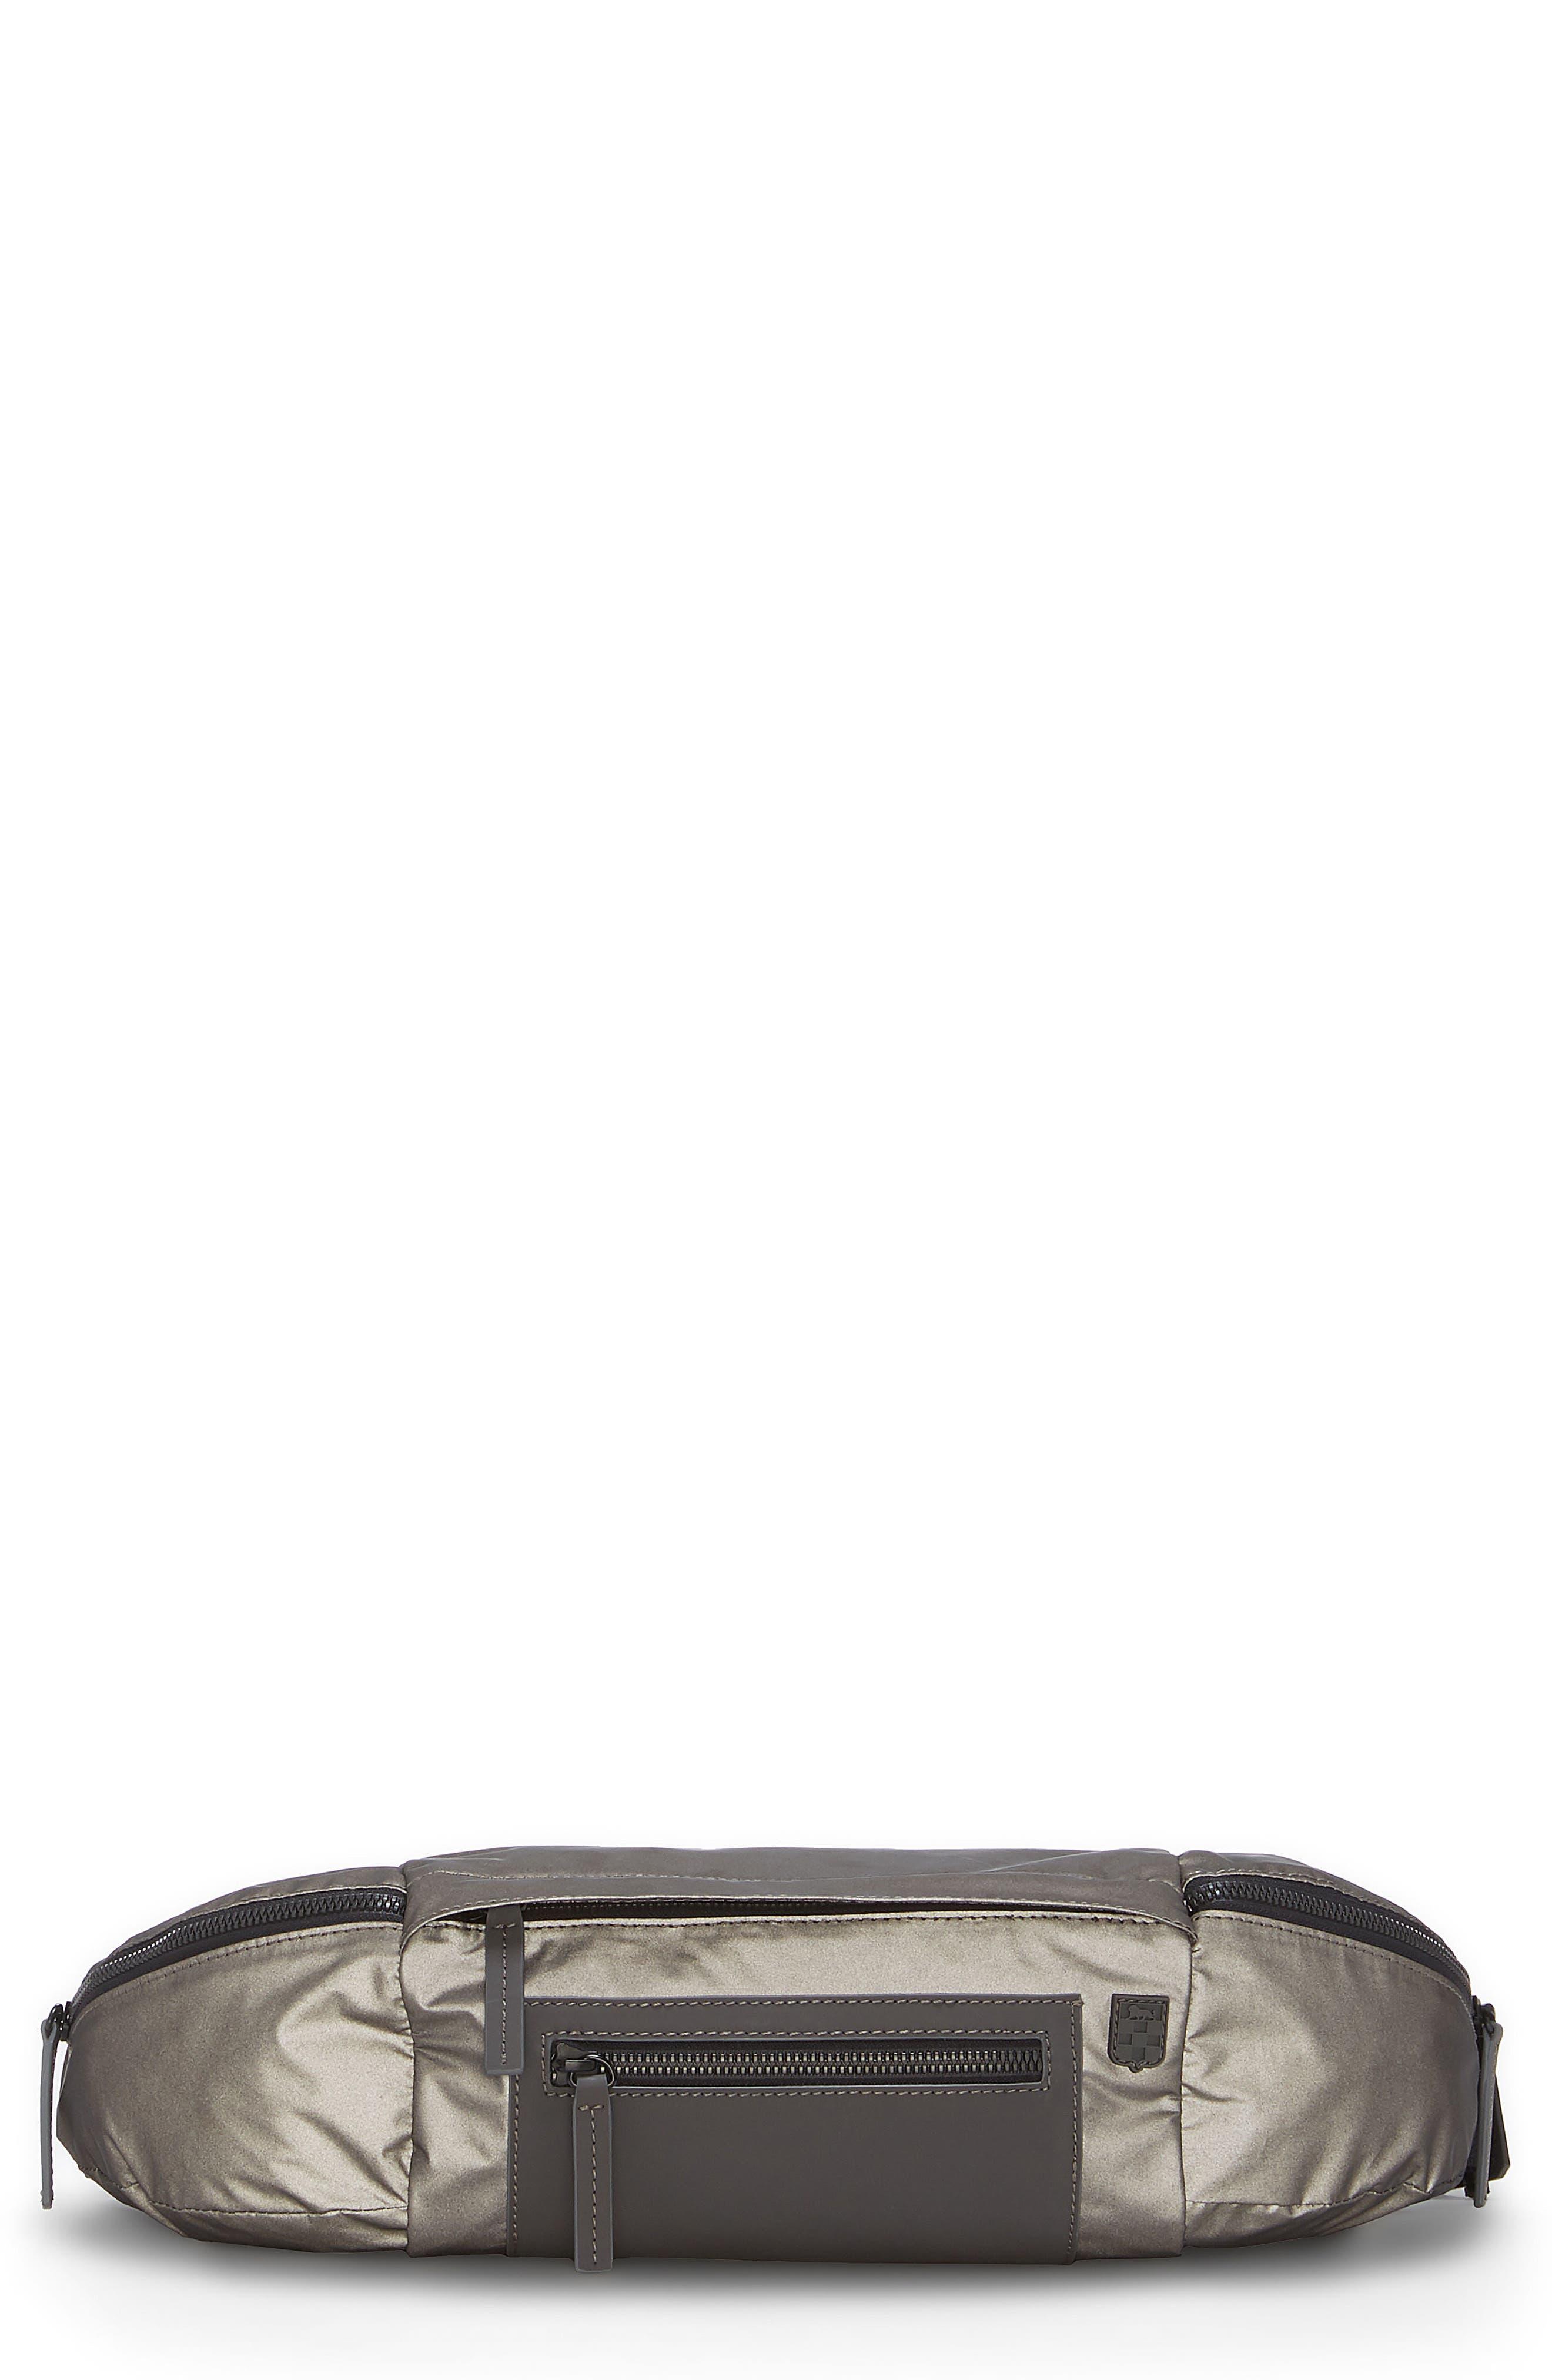 Basin Sling Bag,                         Main,                         color, Titanium